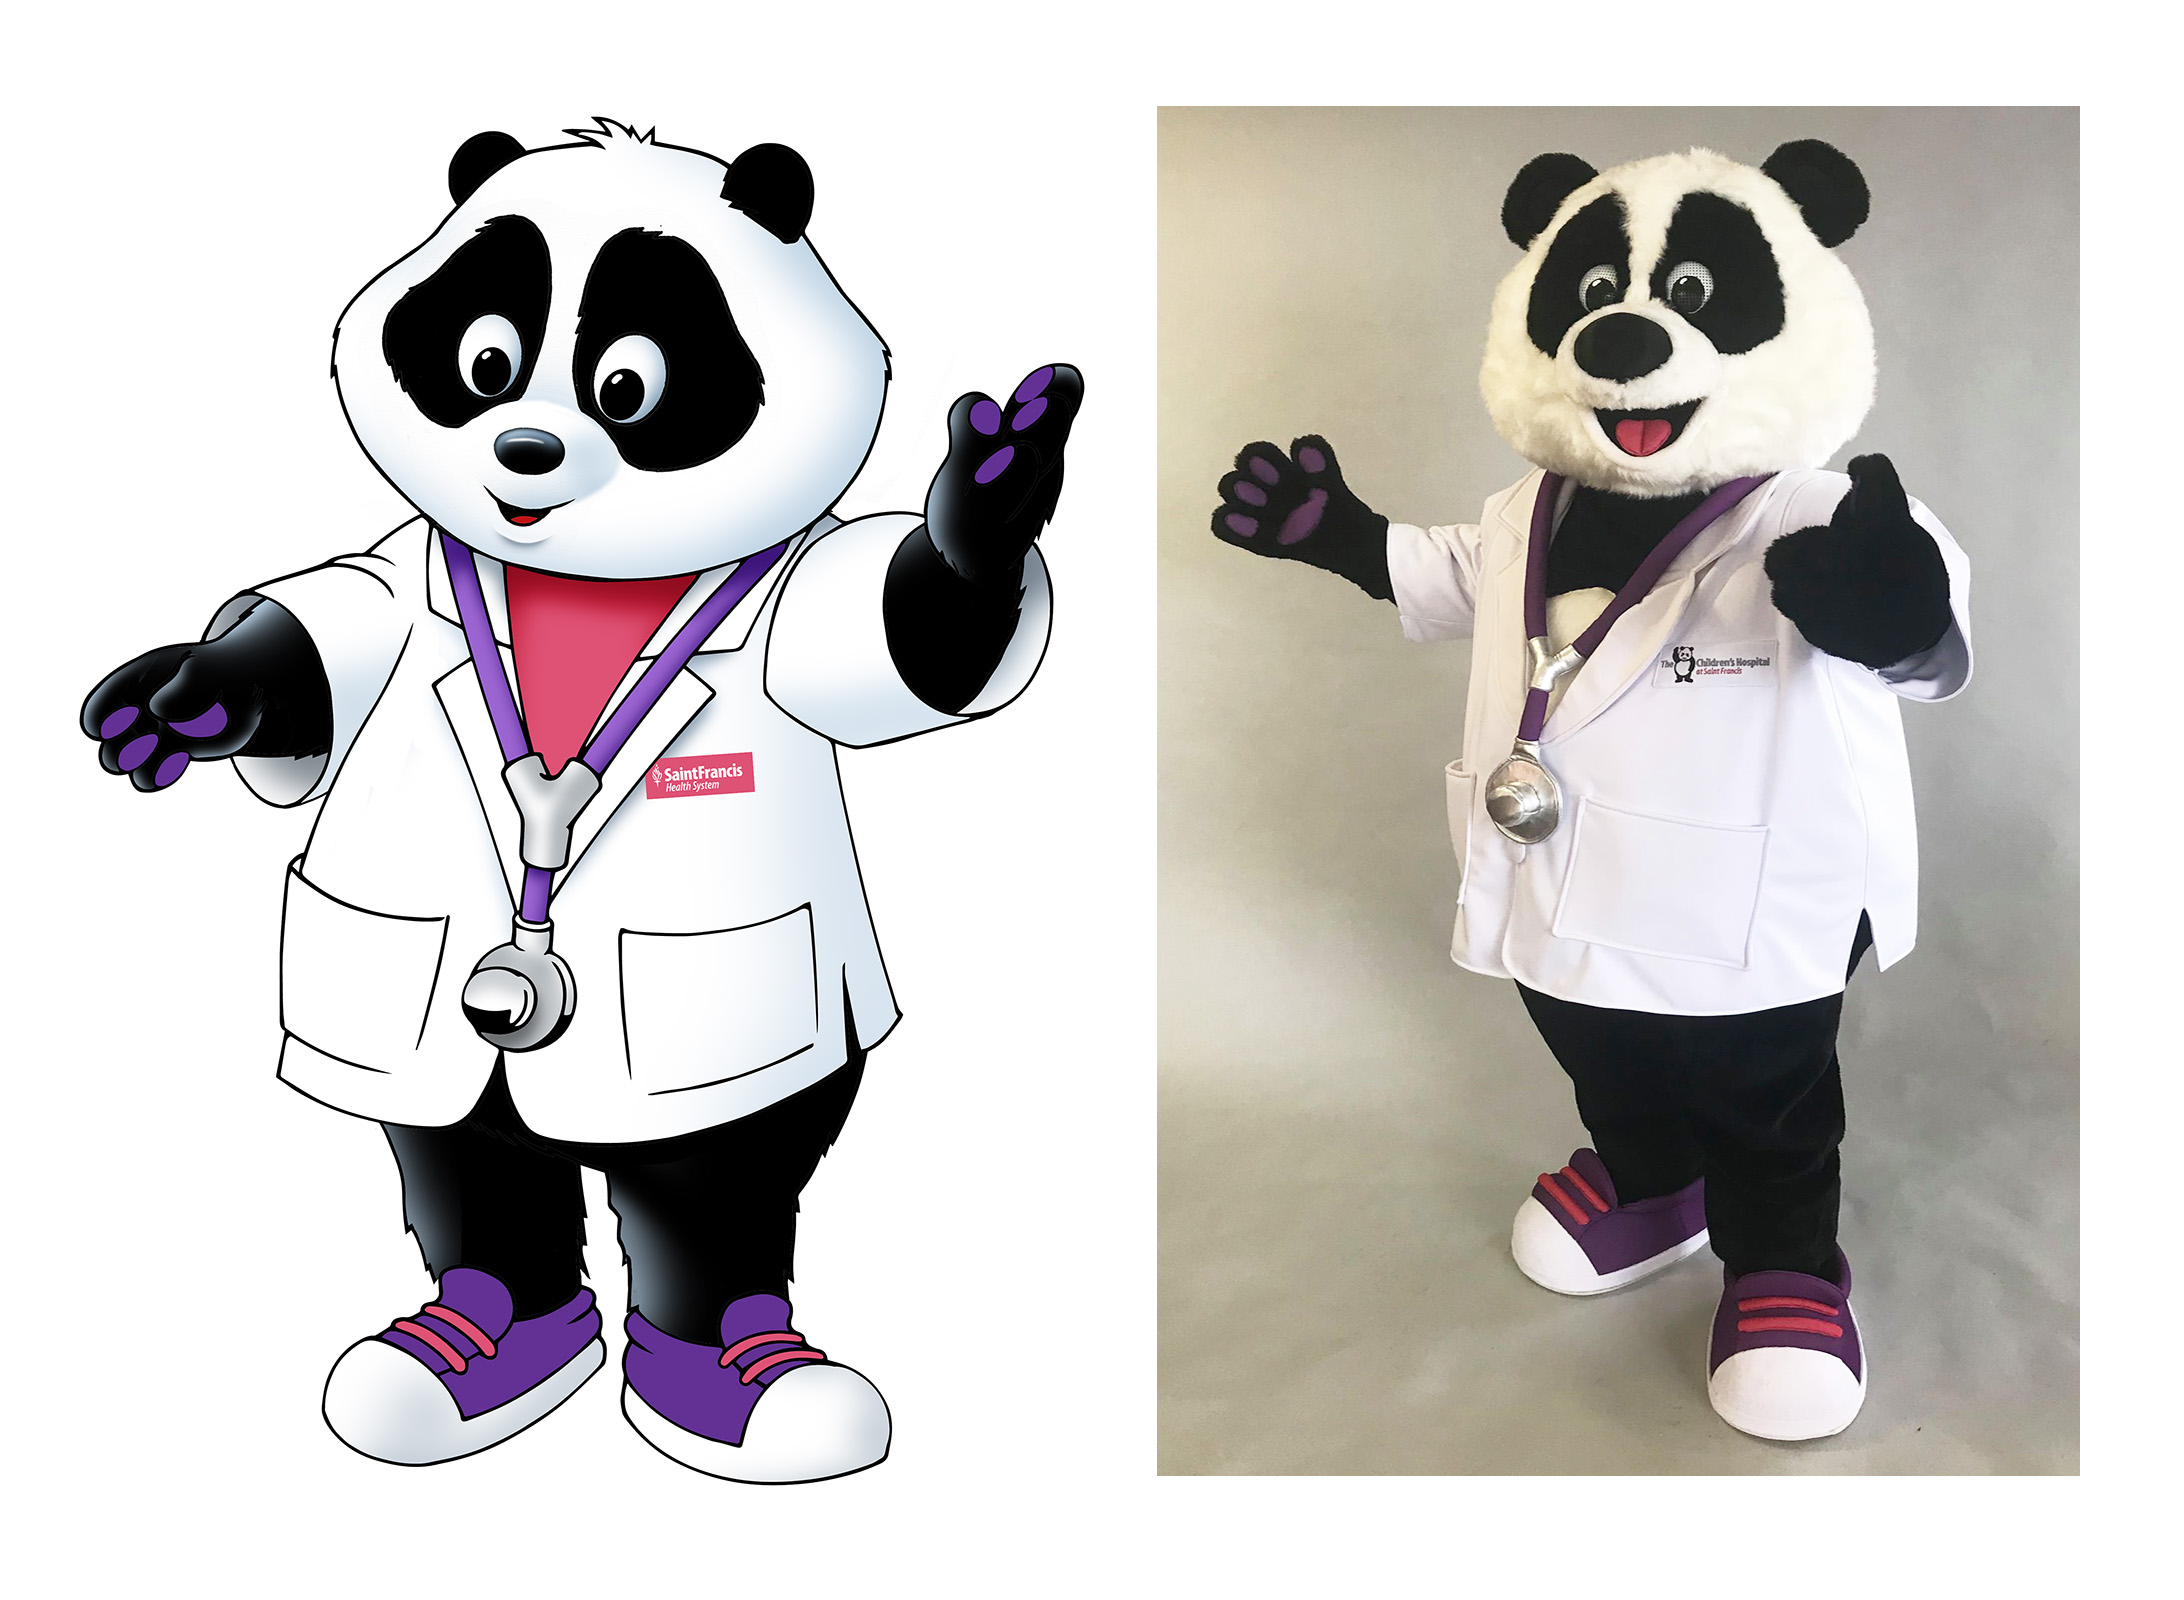 Panda - St. Francis Health System